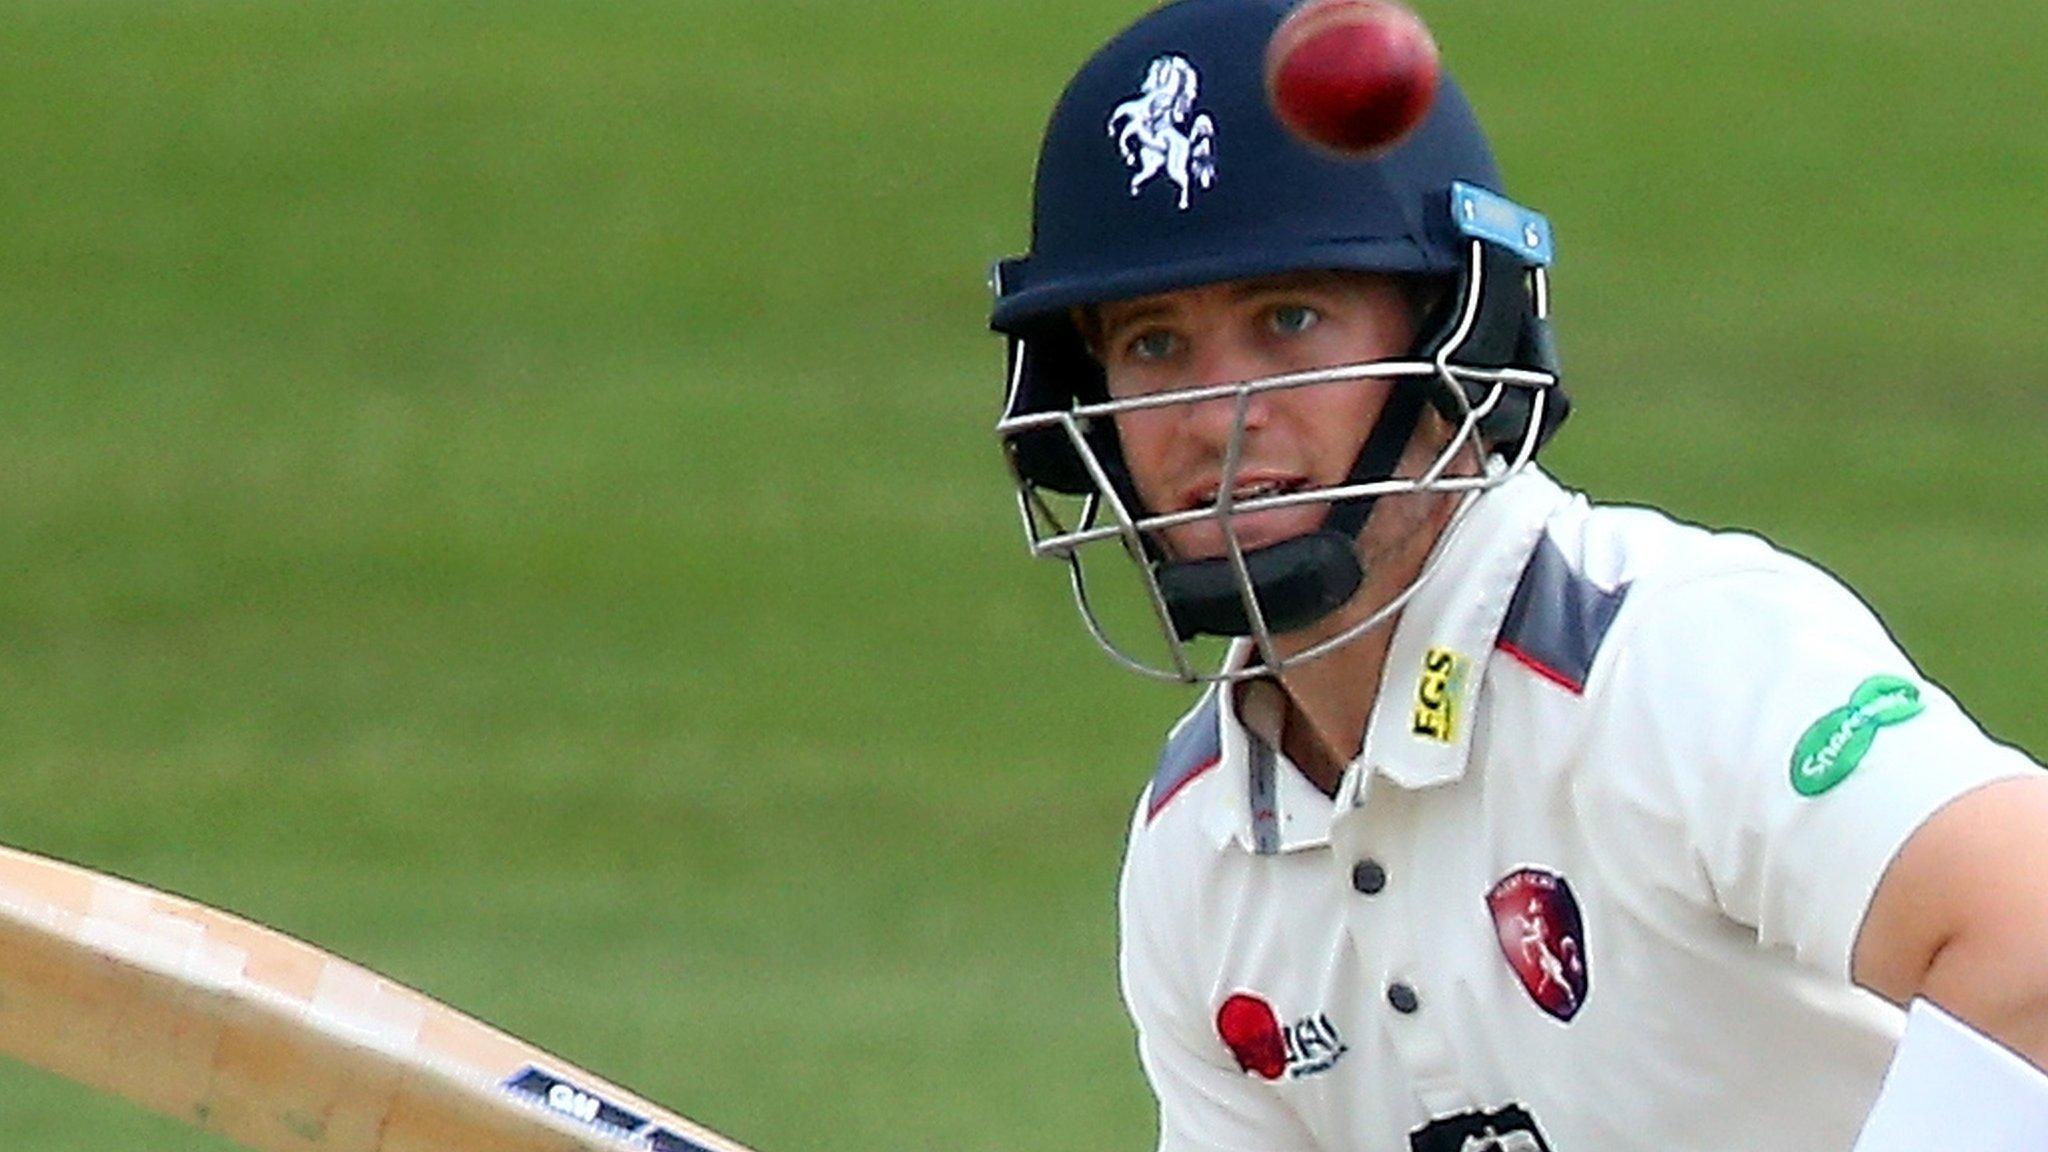 County Championship: Kent batsmen frustrate Surrey in draw